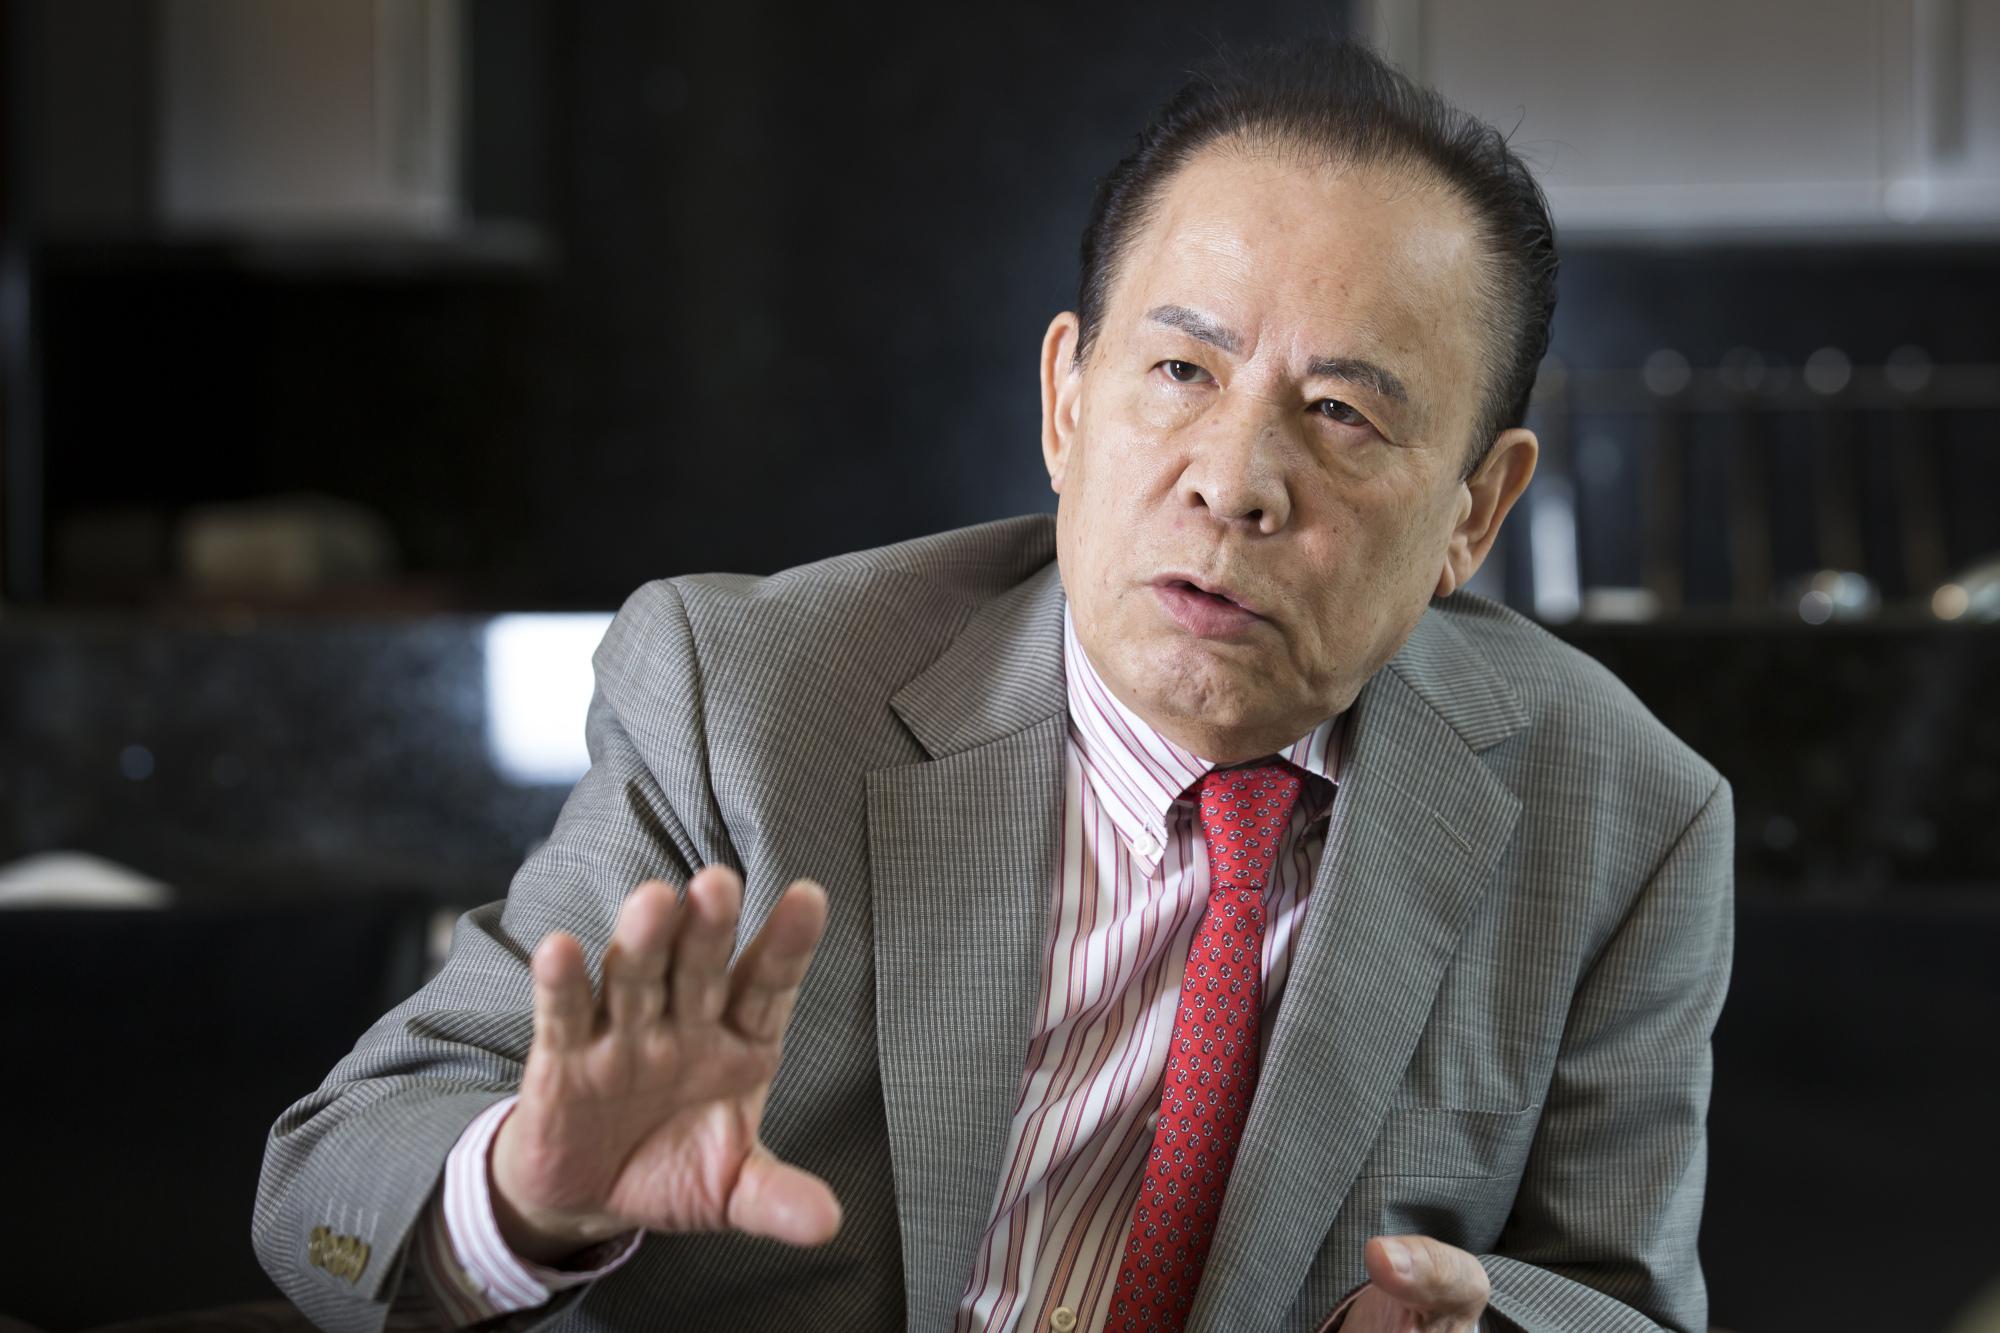 Philippine Court Orders Okada Arrest for Alleged Embezzlement